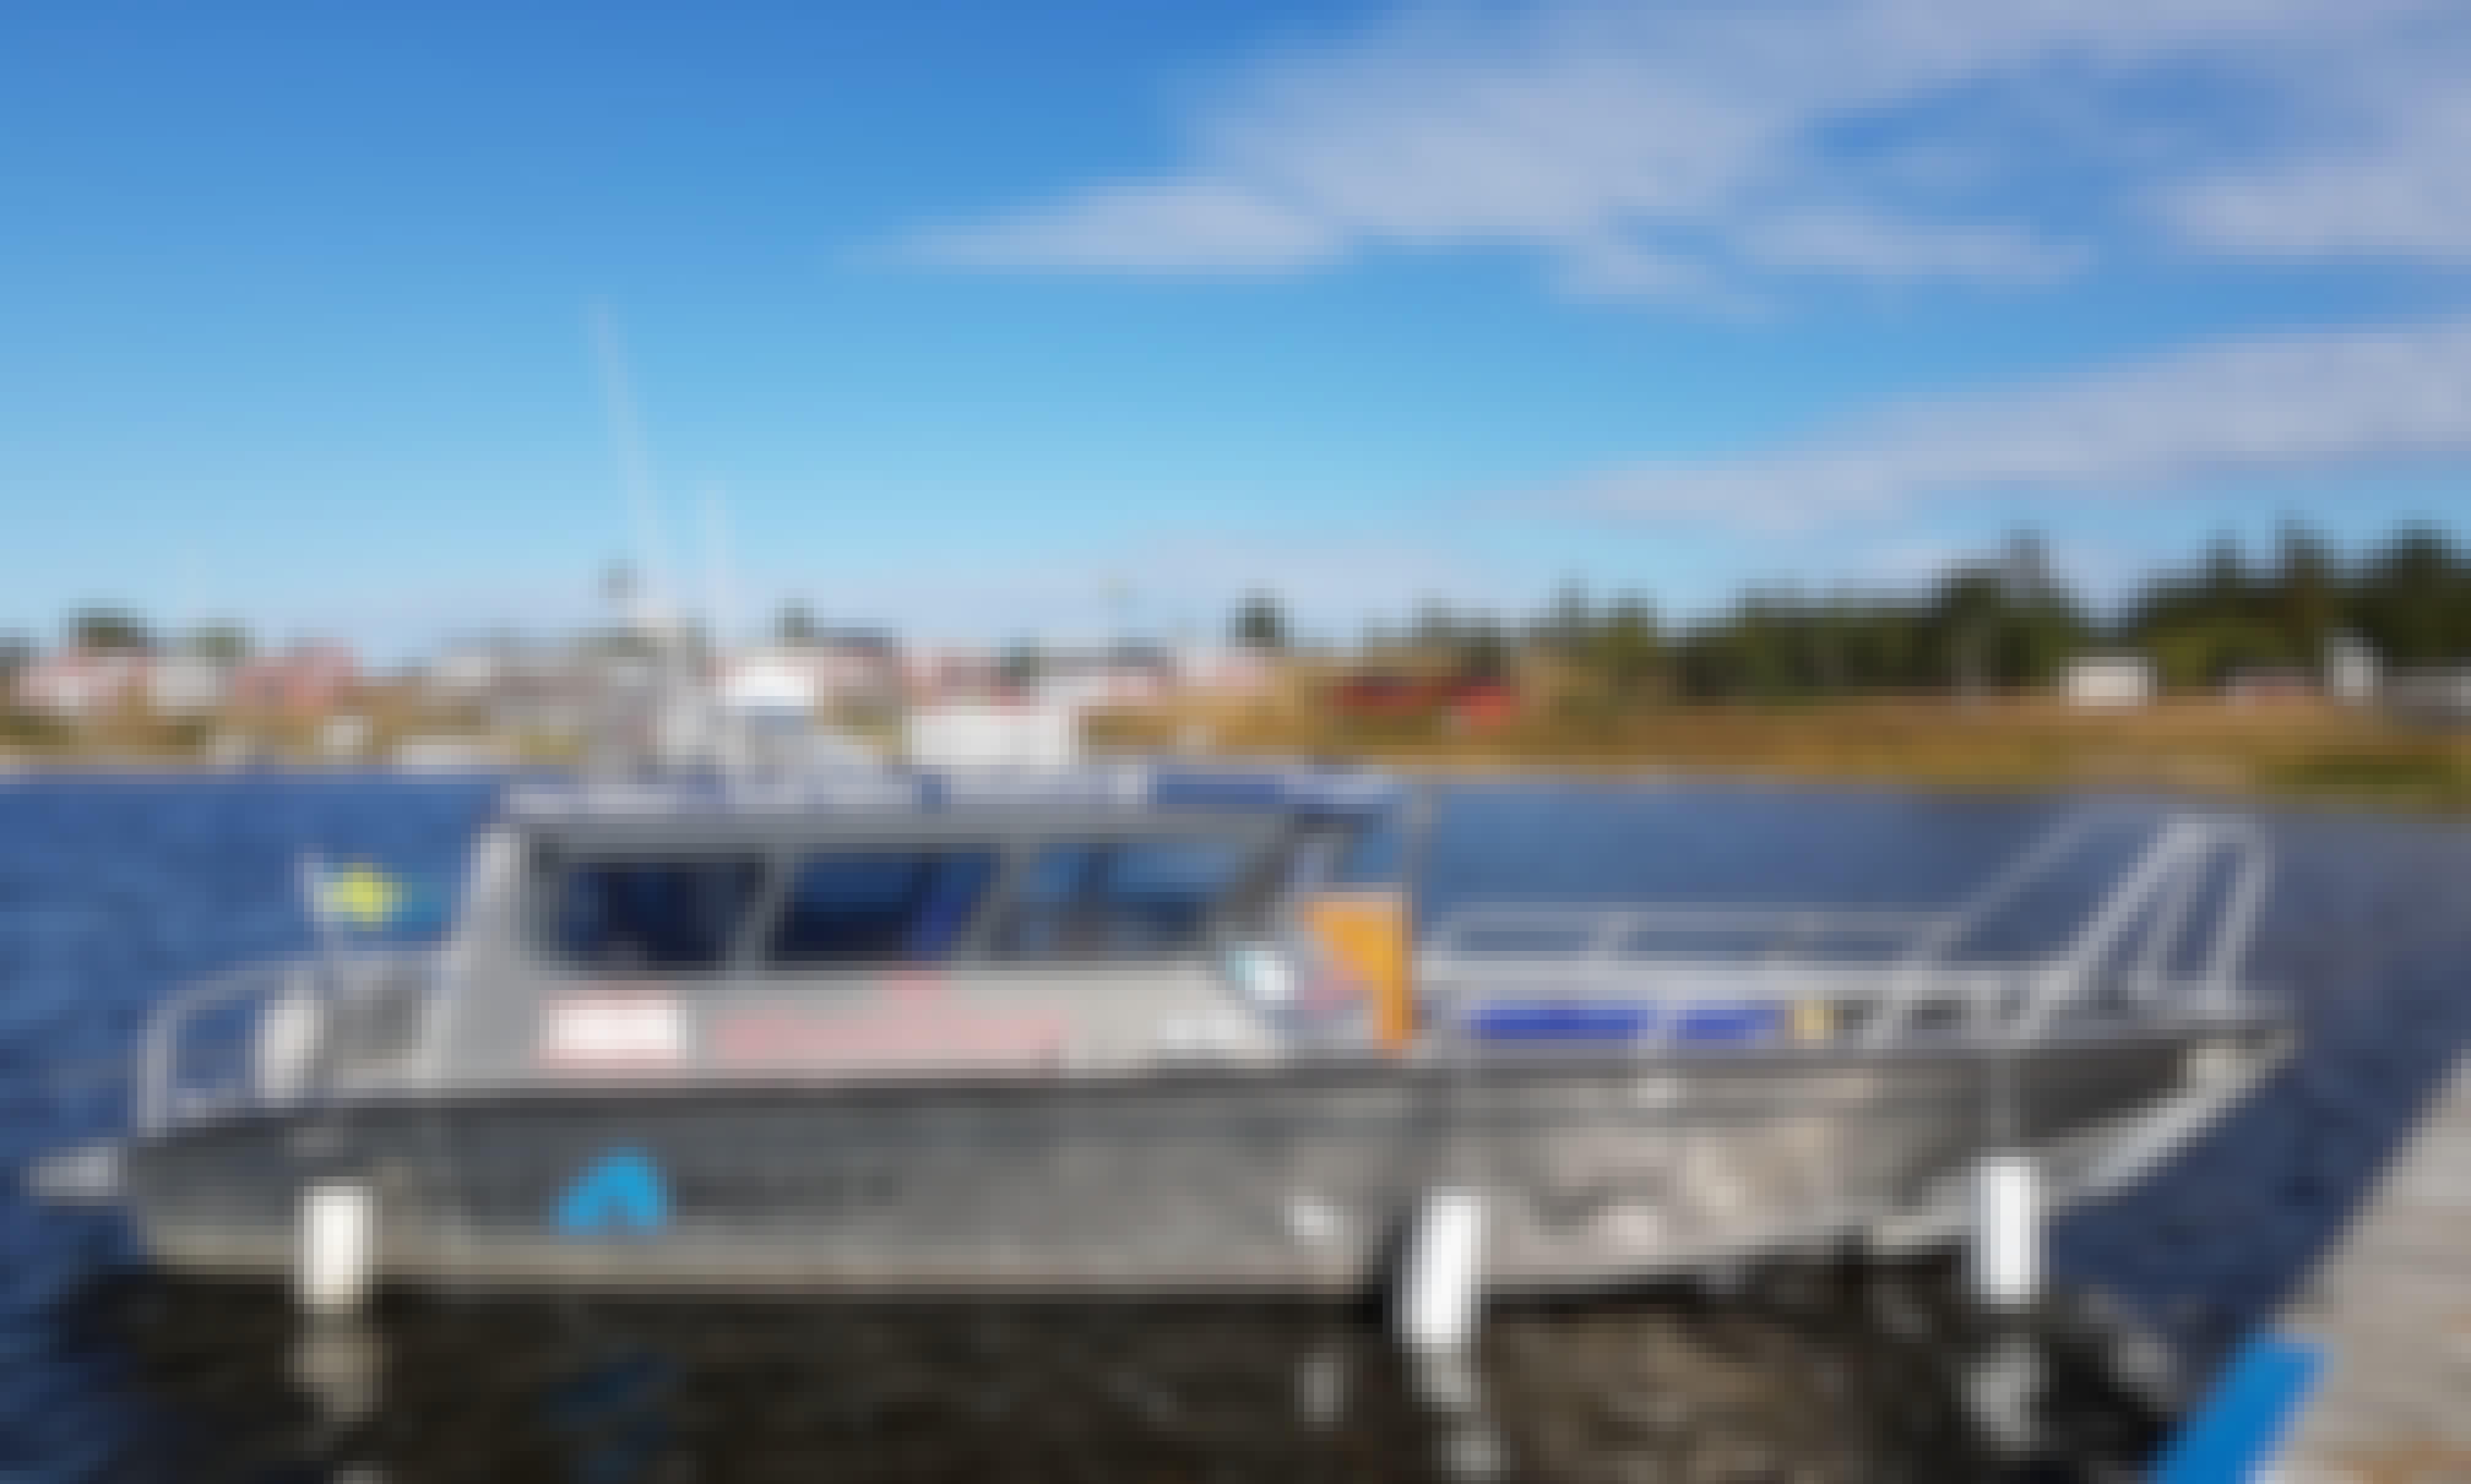 Taxi Boat Transfer To Piteå Island Cottages